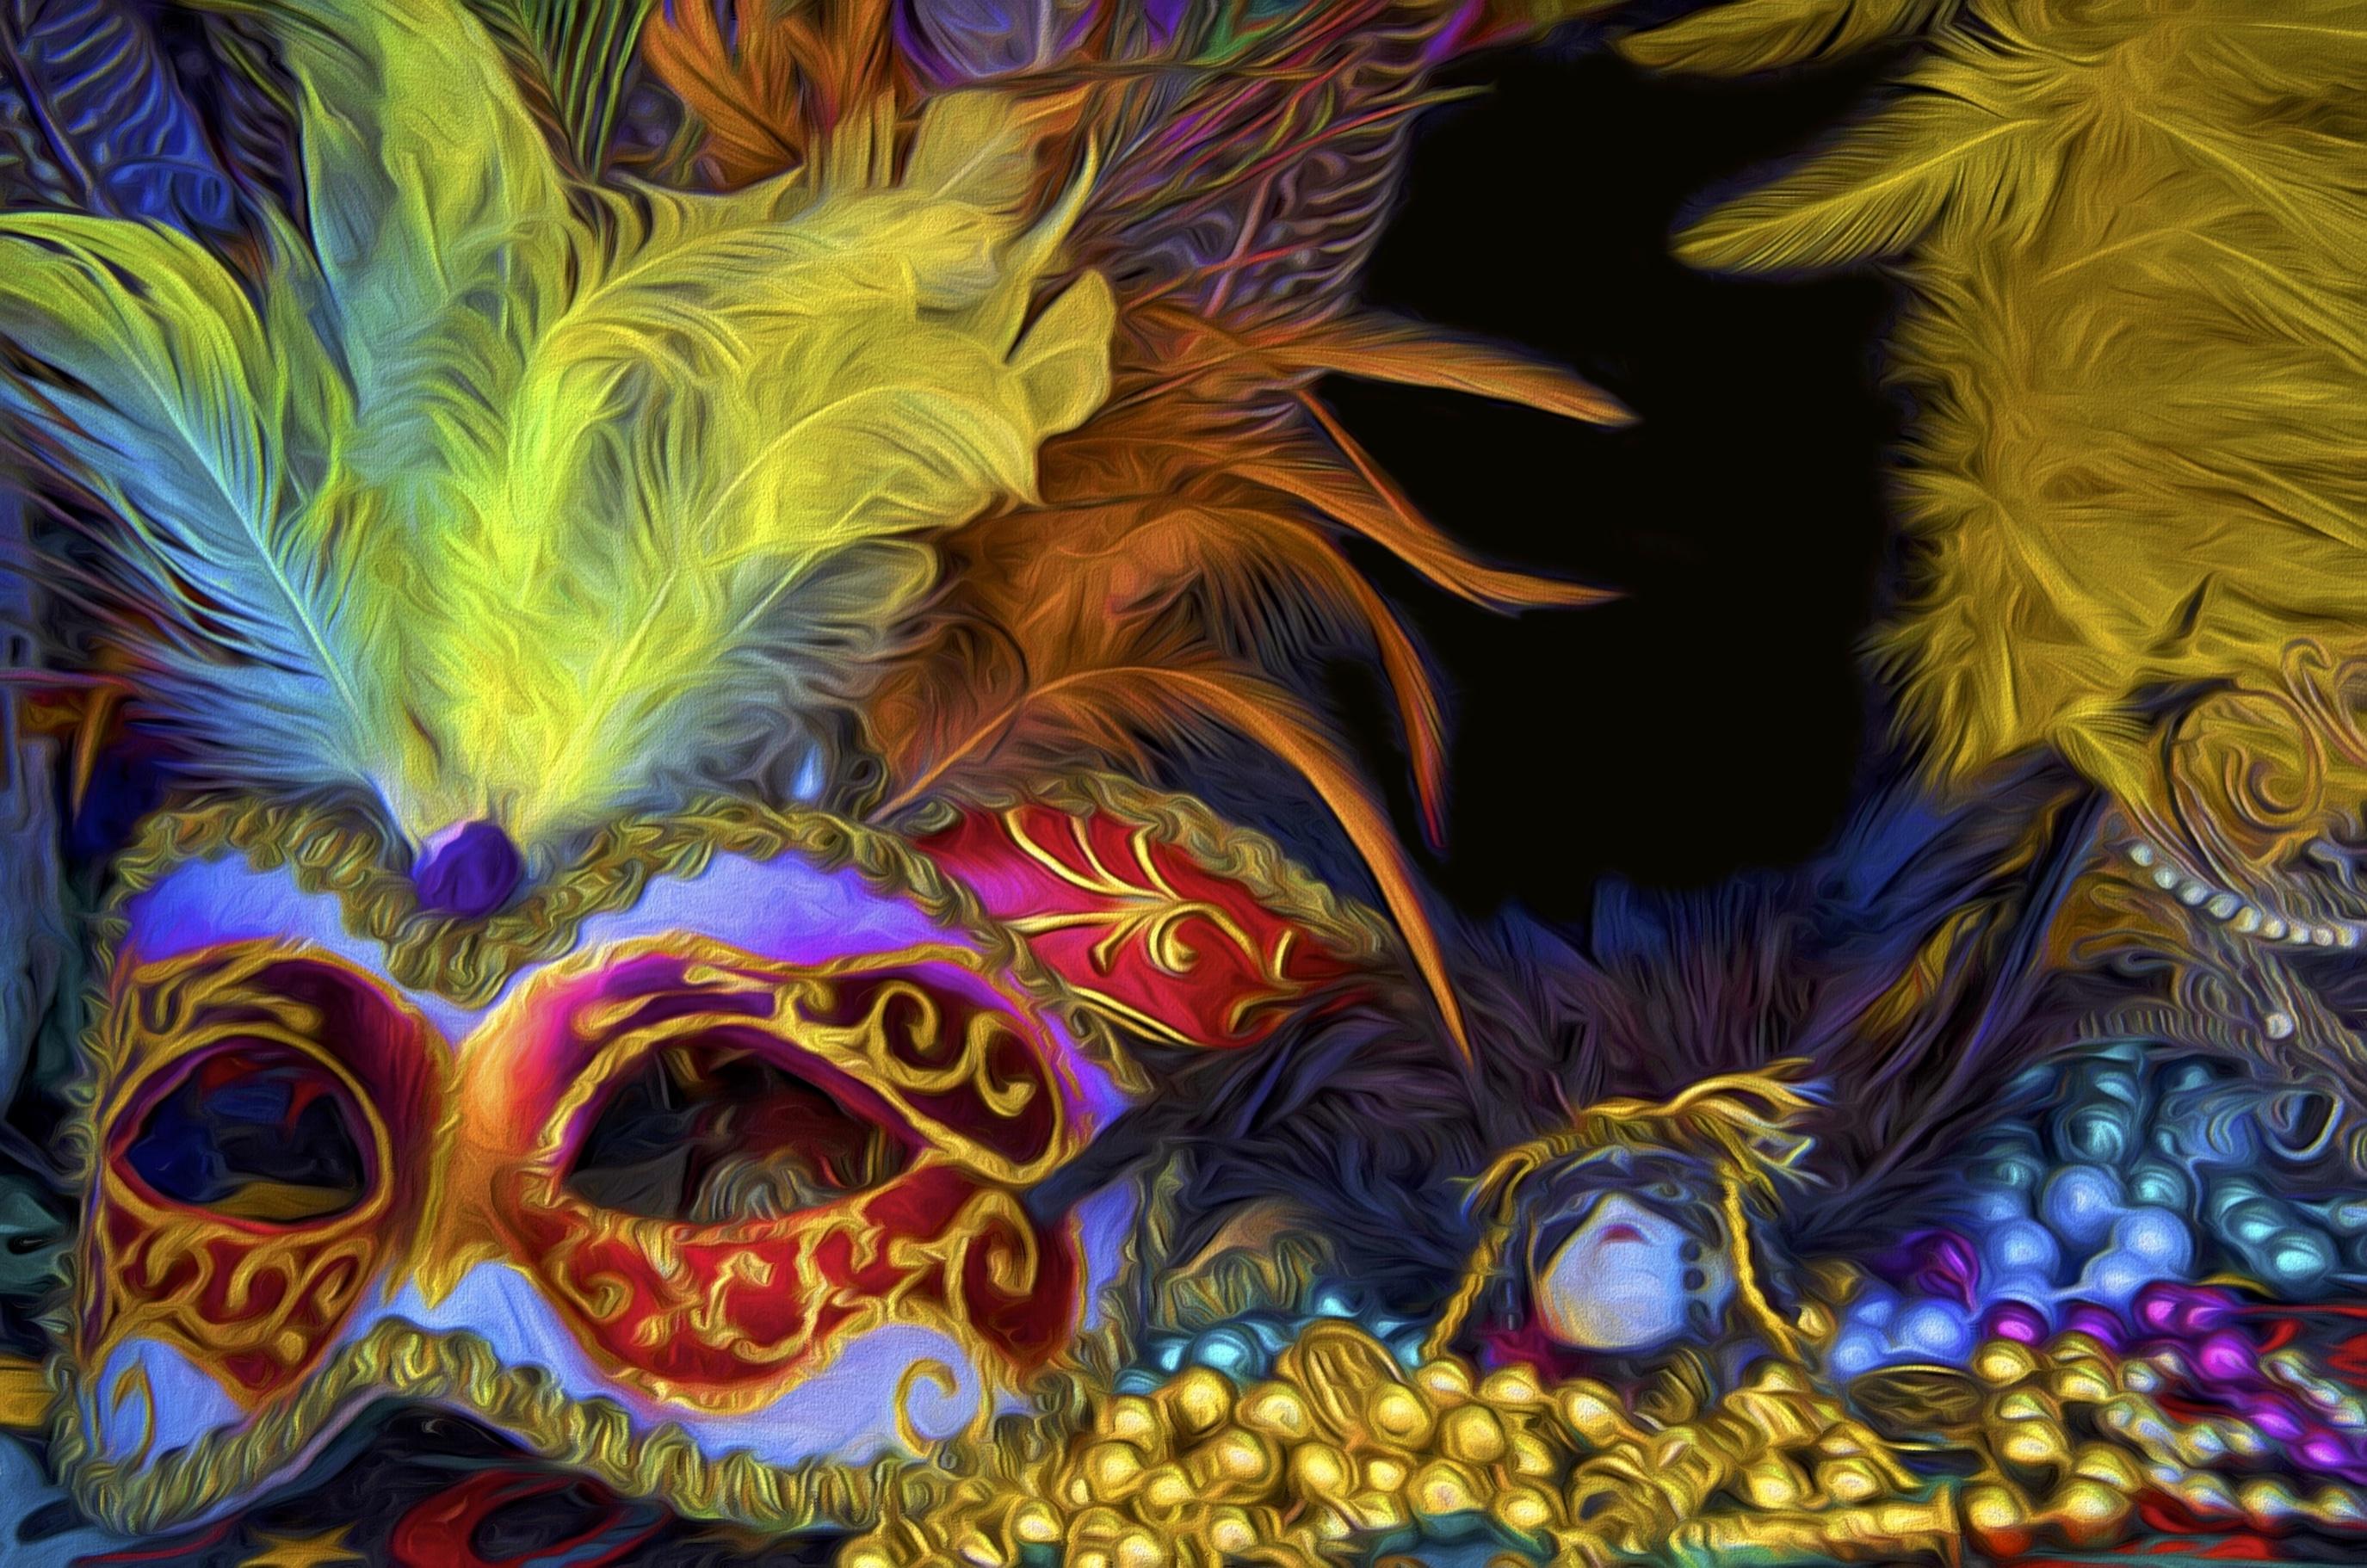 wallpaper mask costumes louisiana carnival art color vibrant